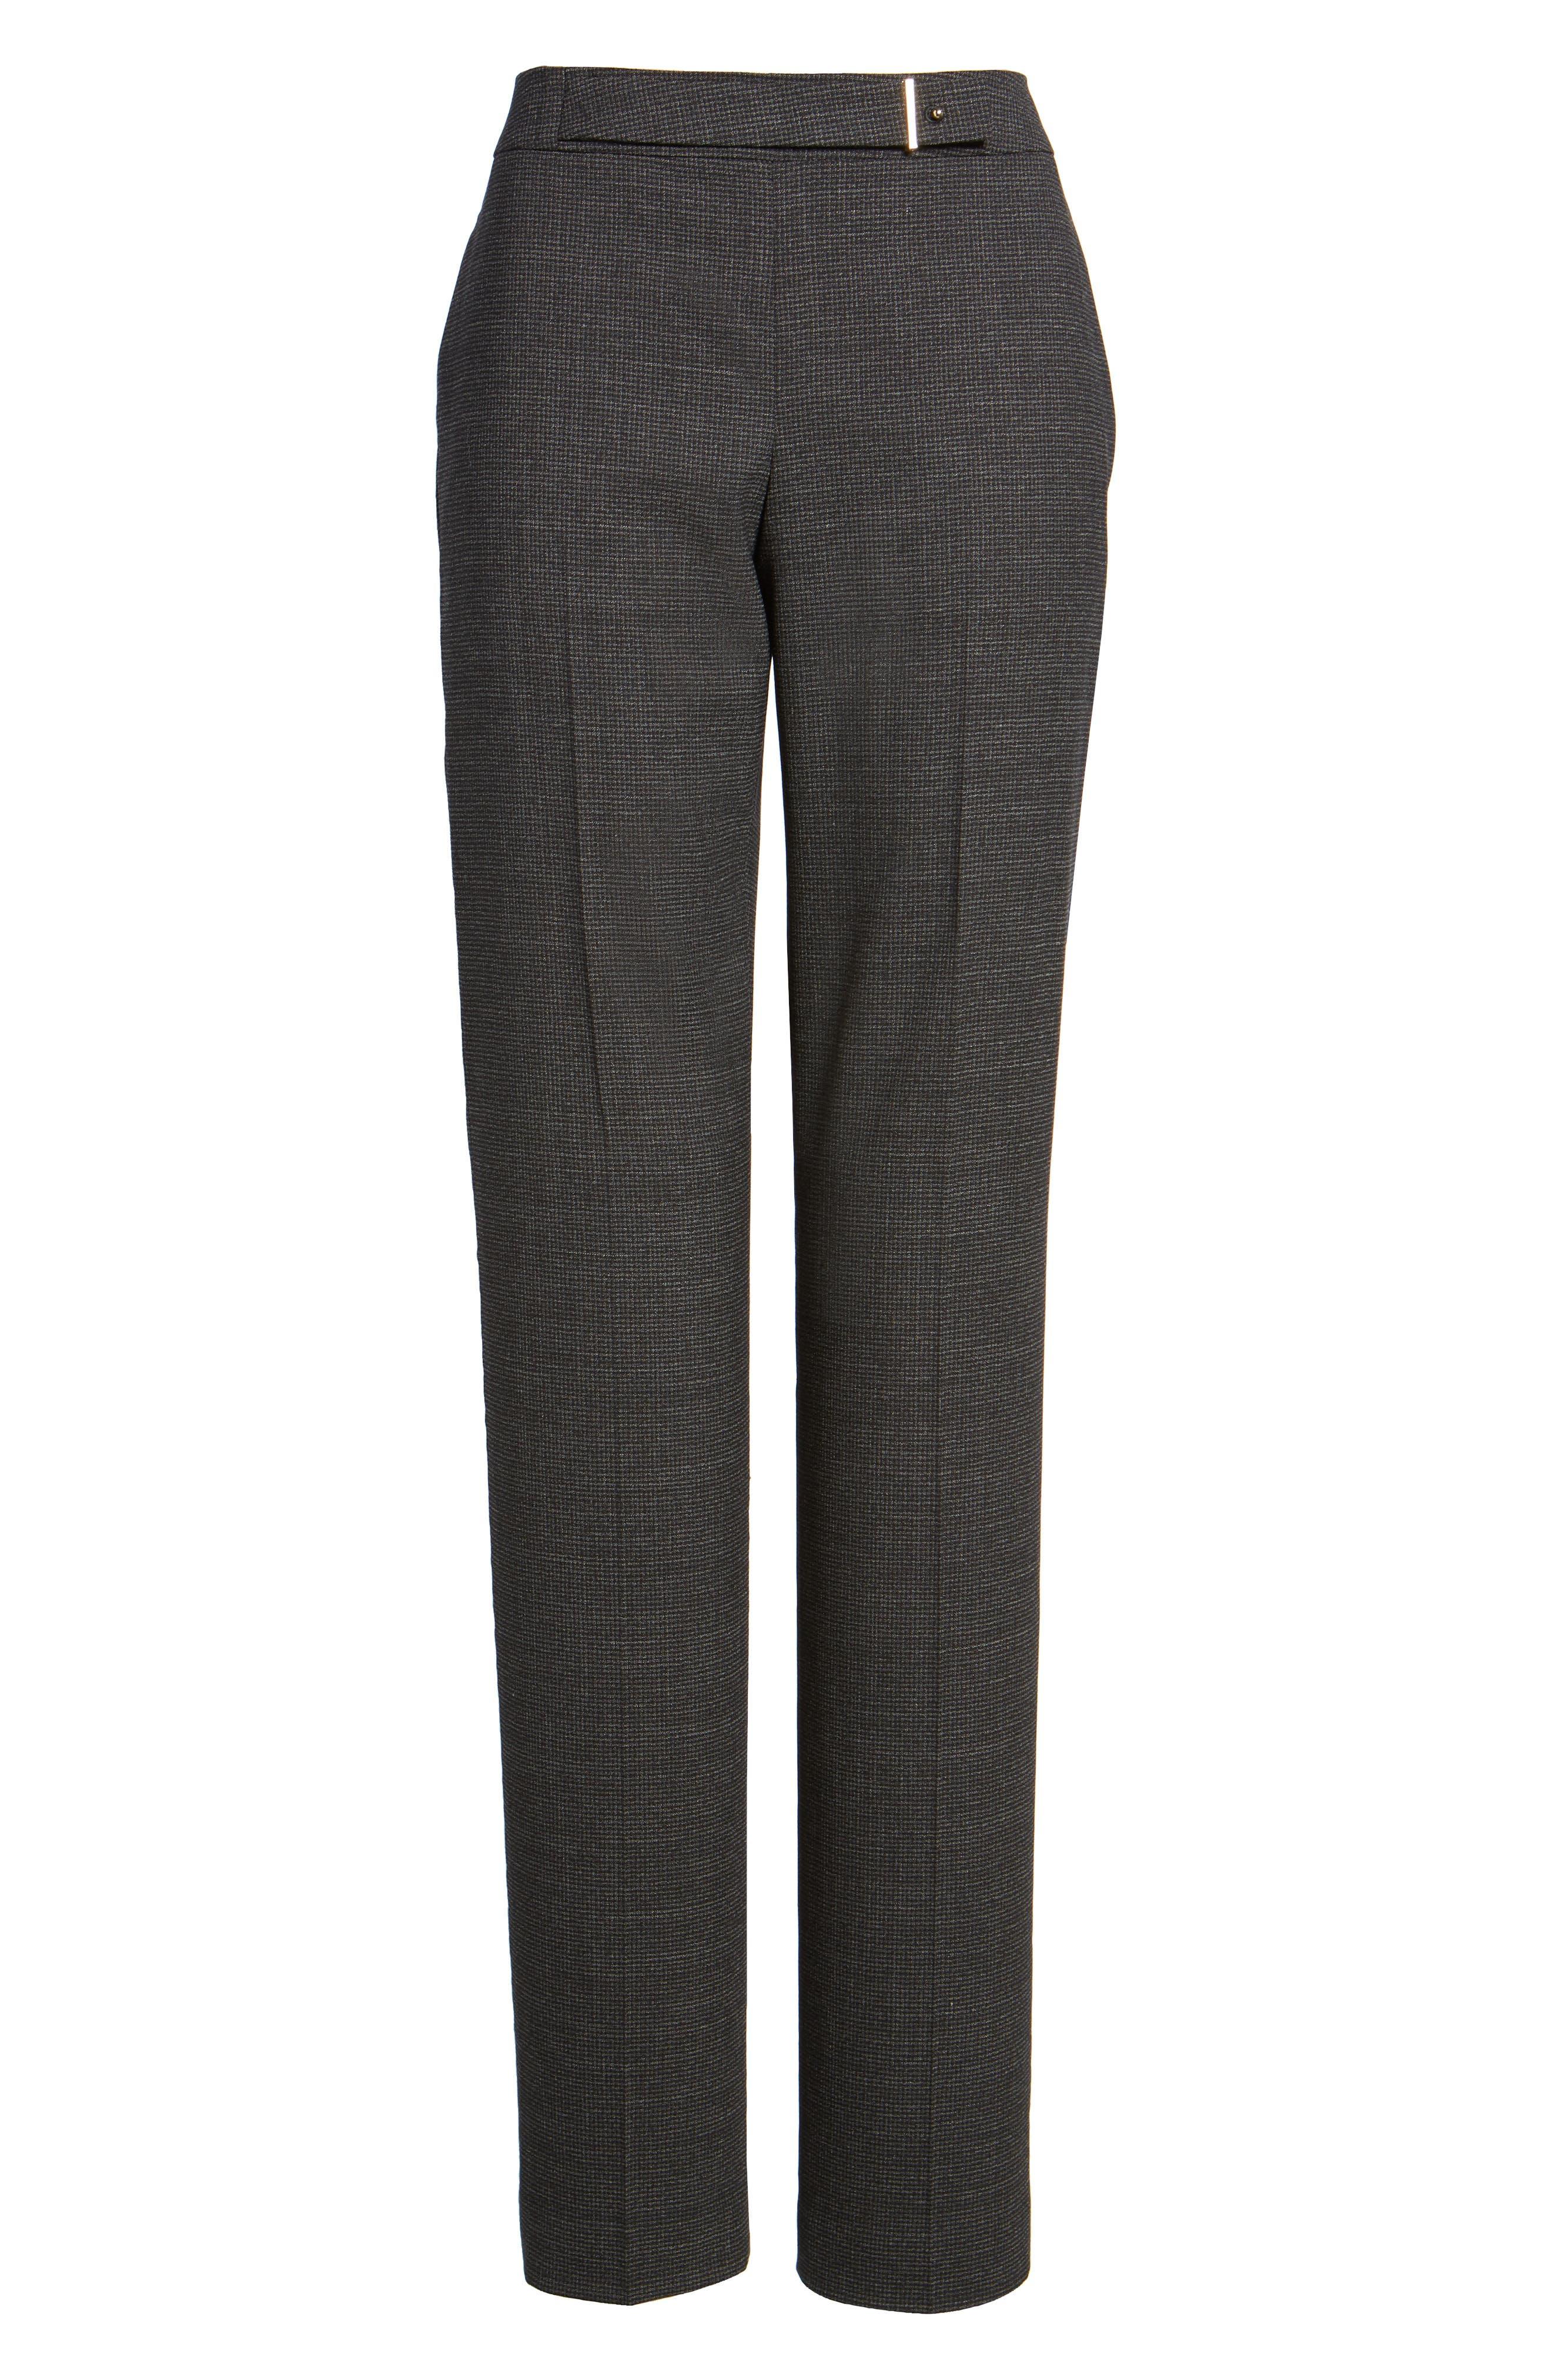 Tafena Check Stretch Wool Pants,                             Alternate thumbnail 6, color,                             006